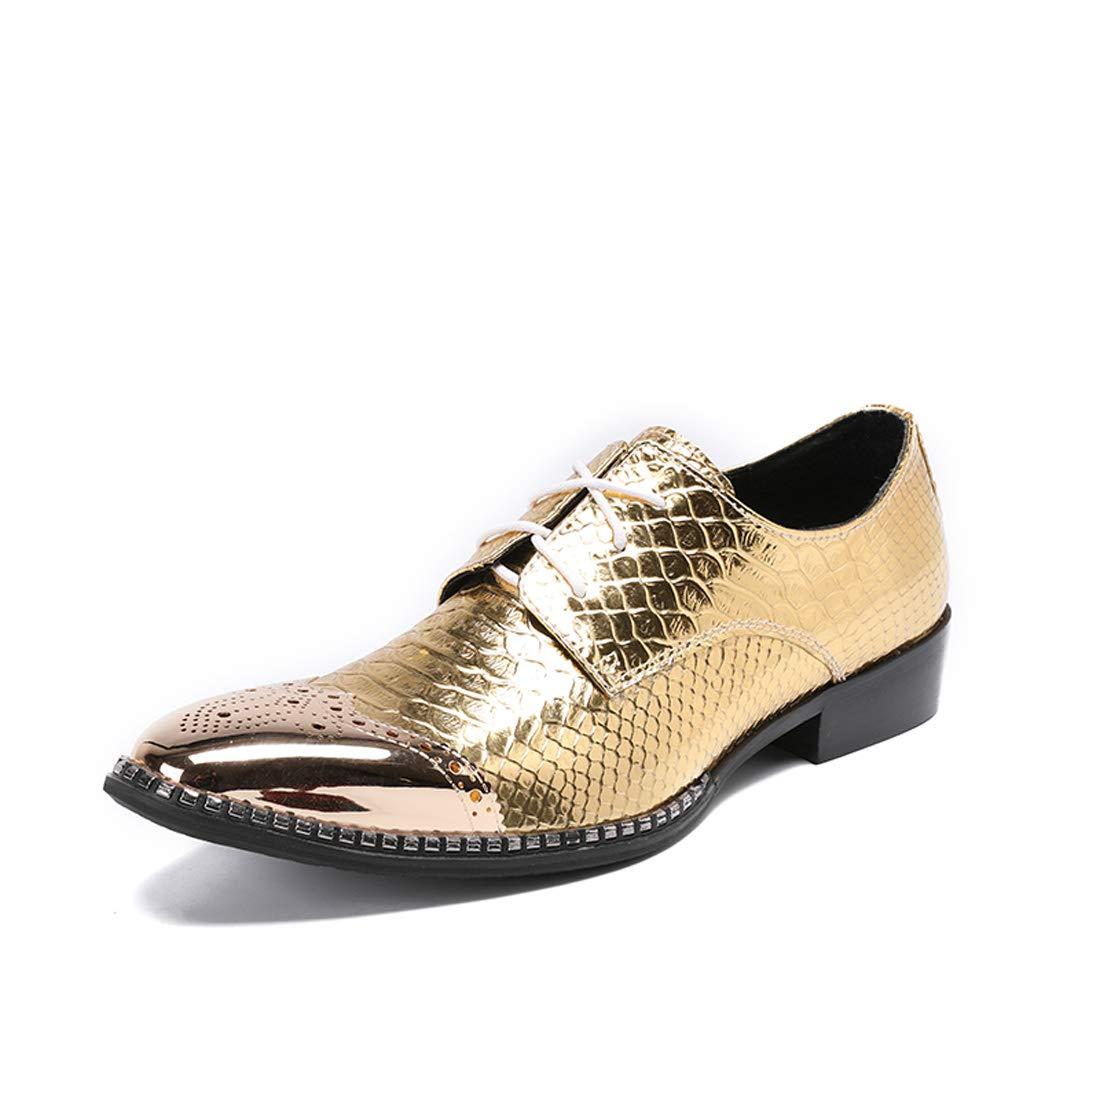 DANDANJIE Herren Formale Schuhe Leder Fallen Winter Oxfords Party & Abend Neuheit Schuhe